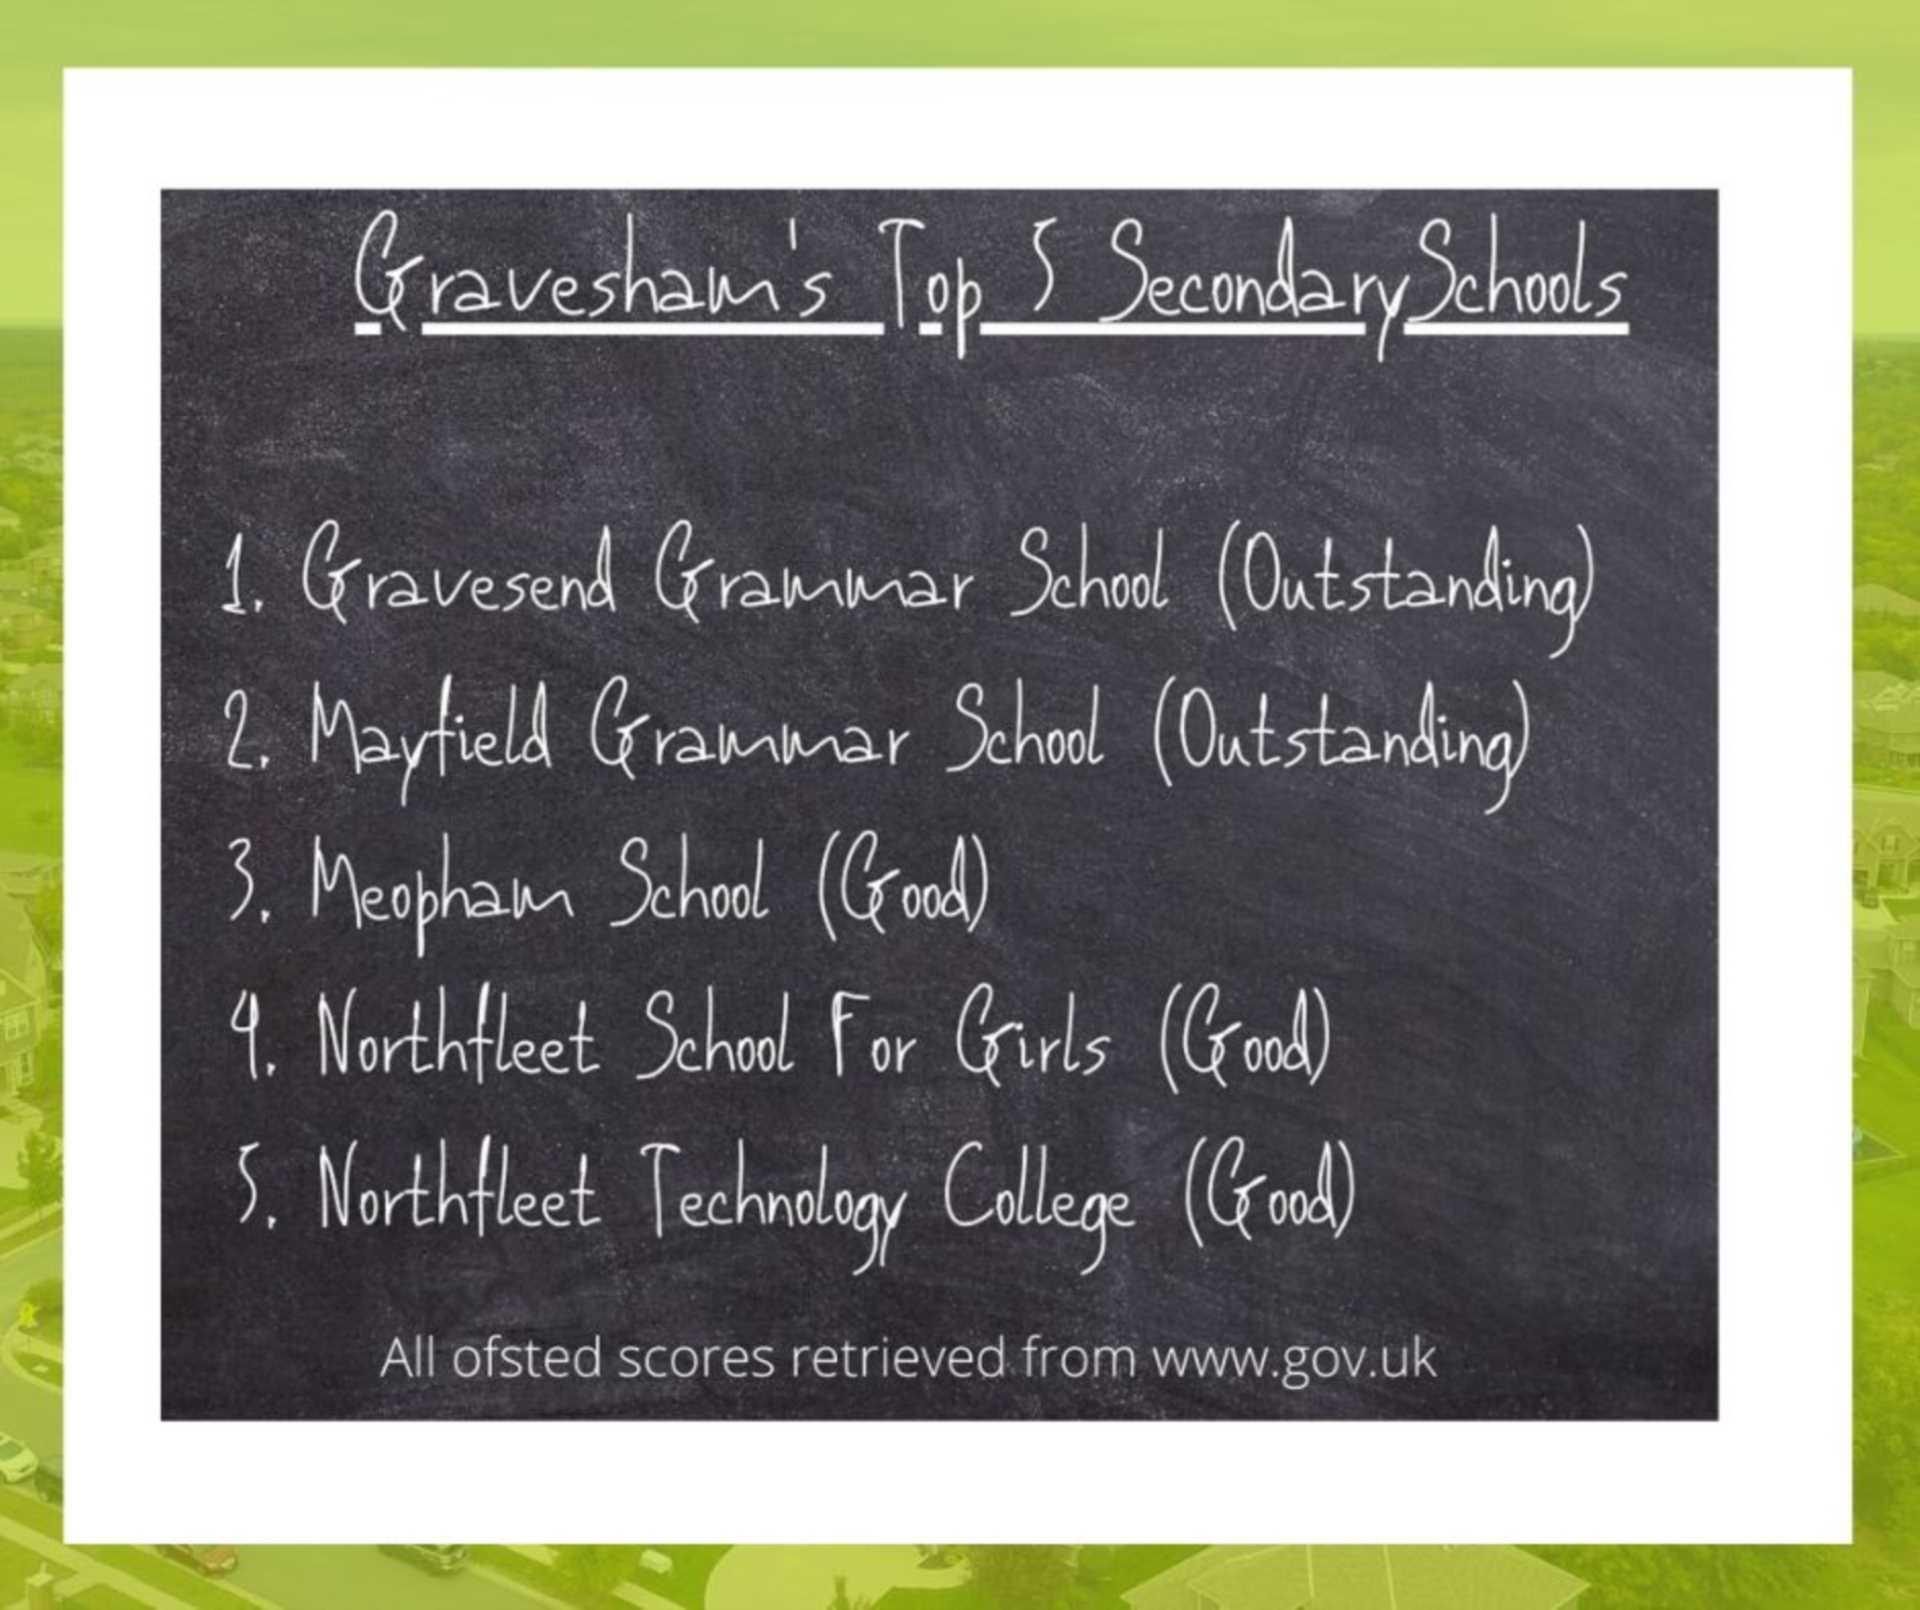 Top 5 Secondary Schools In Gravesham